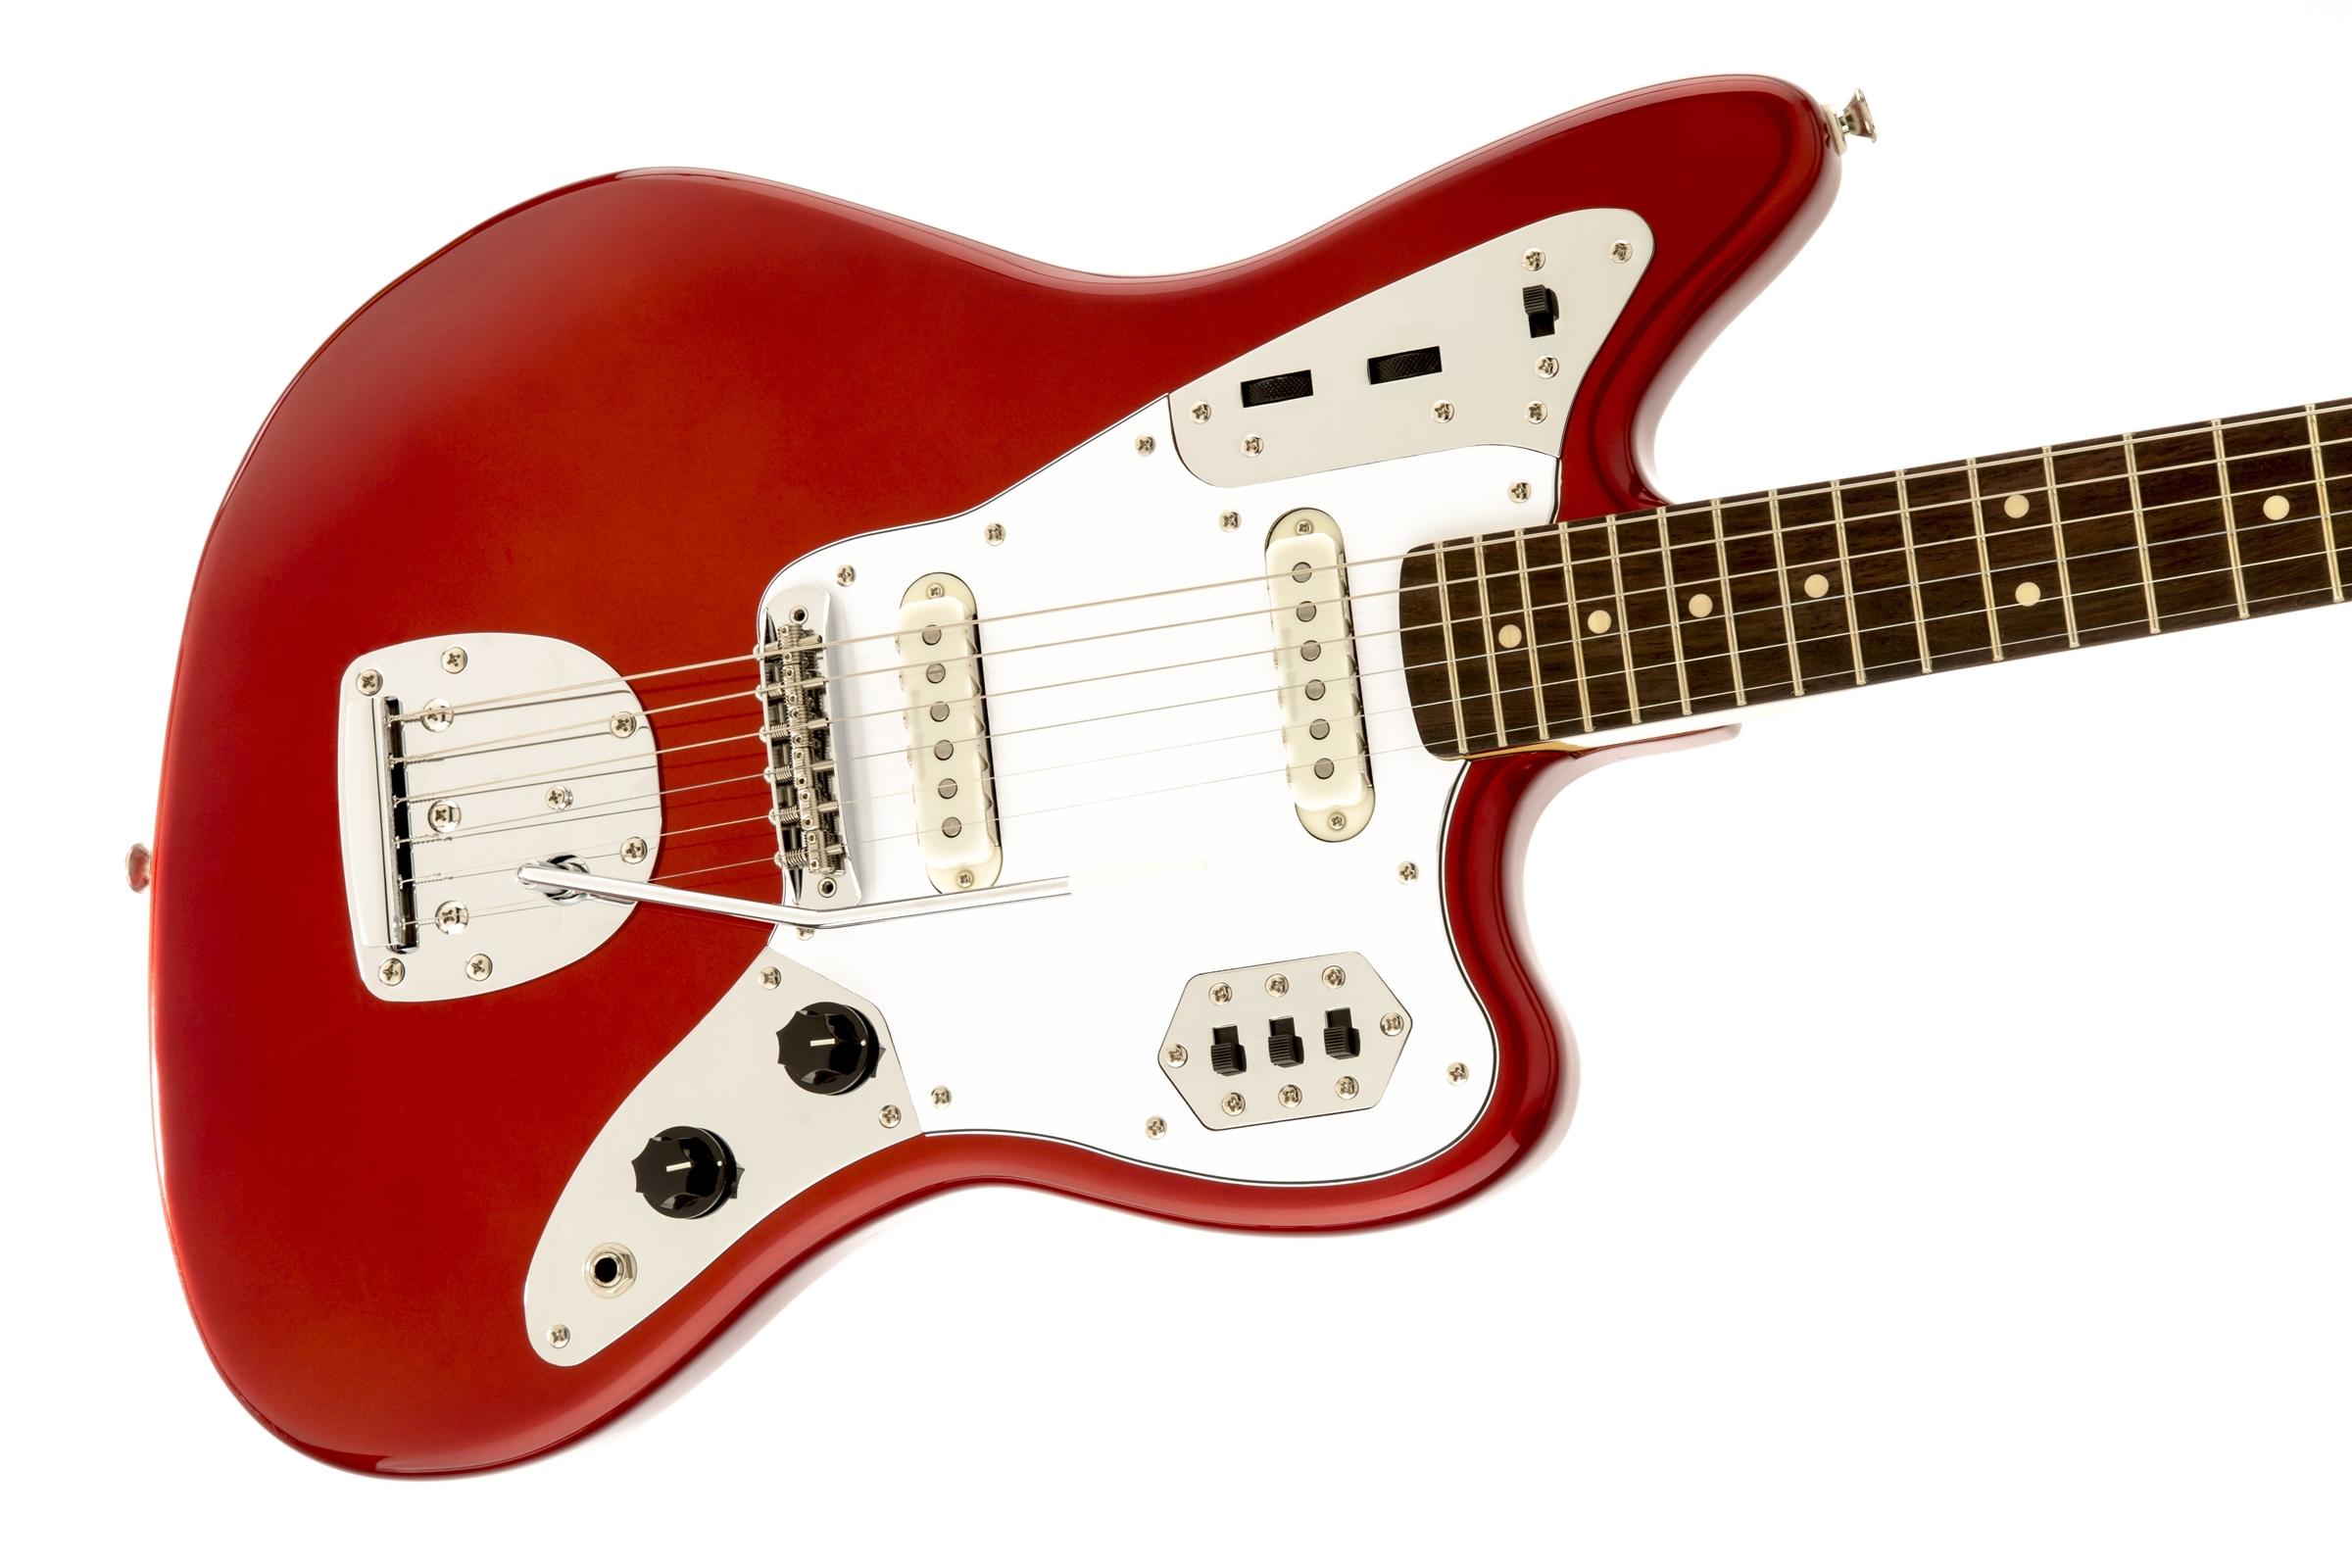 squier vintage modified jaguar rosewood fingerboard candy apple red squier electric guitars. Black Bedroom Furniture Sets. Home Design Ideas